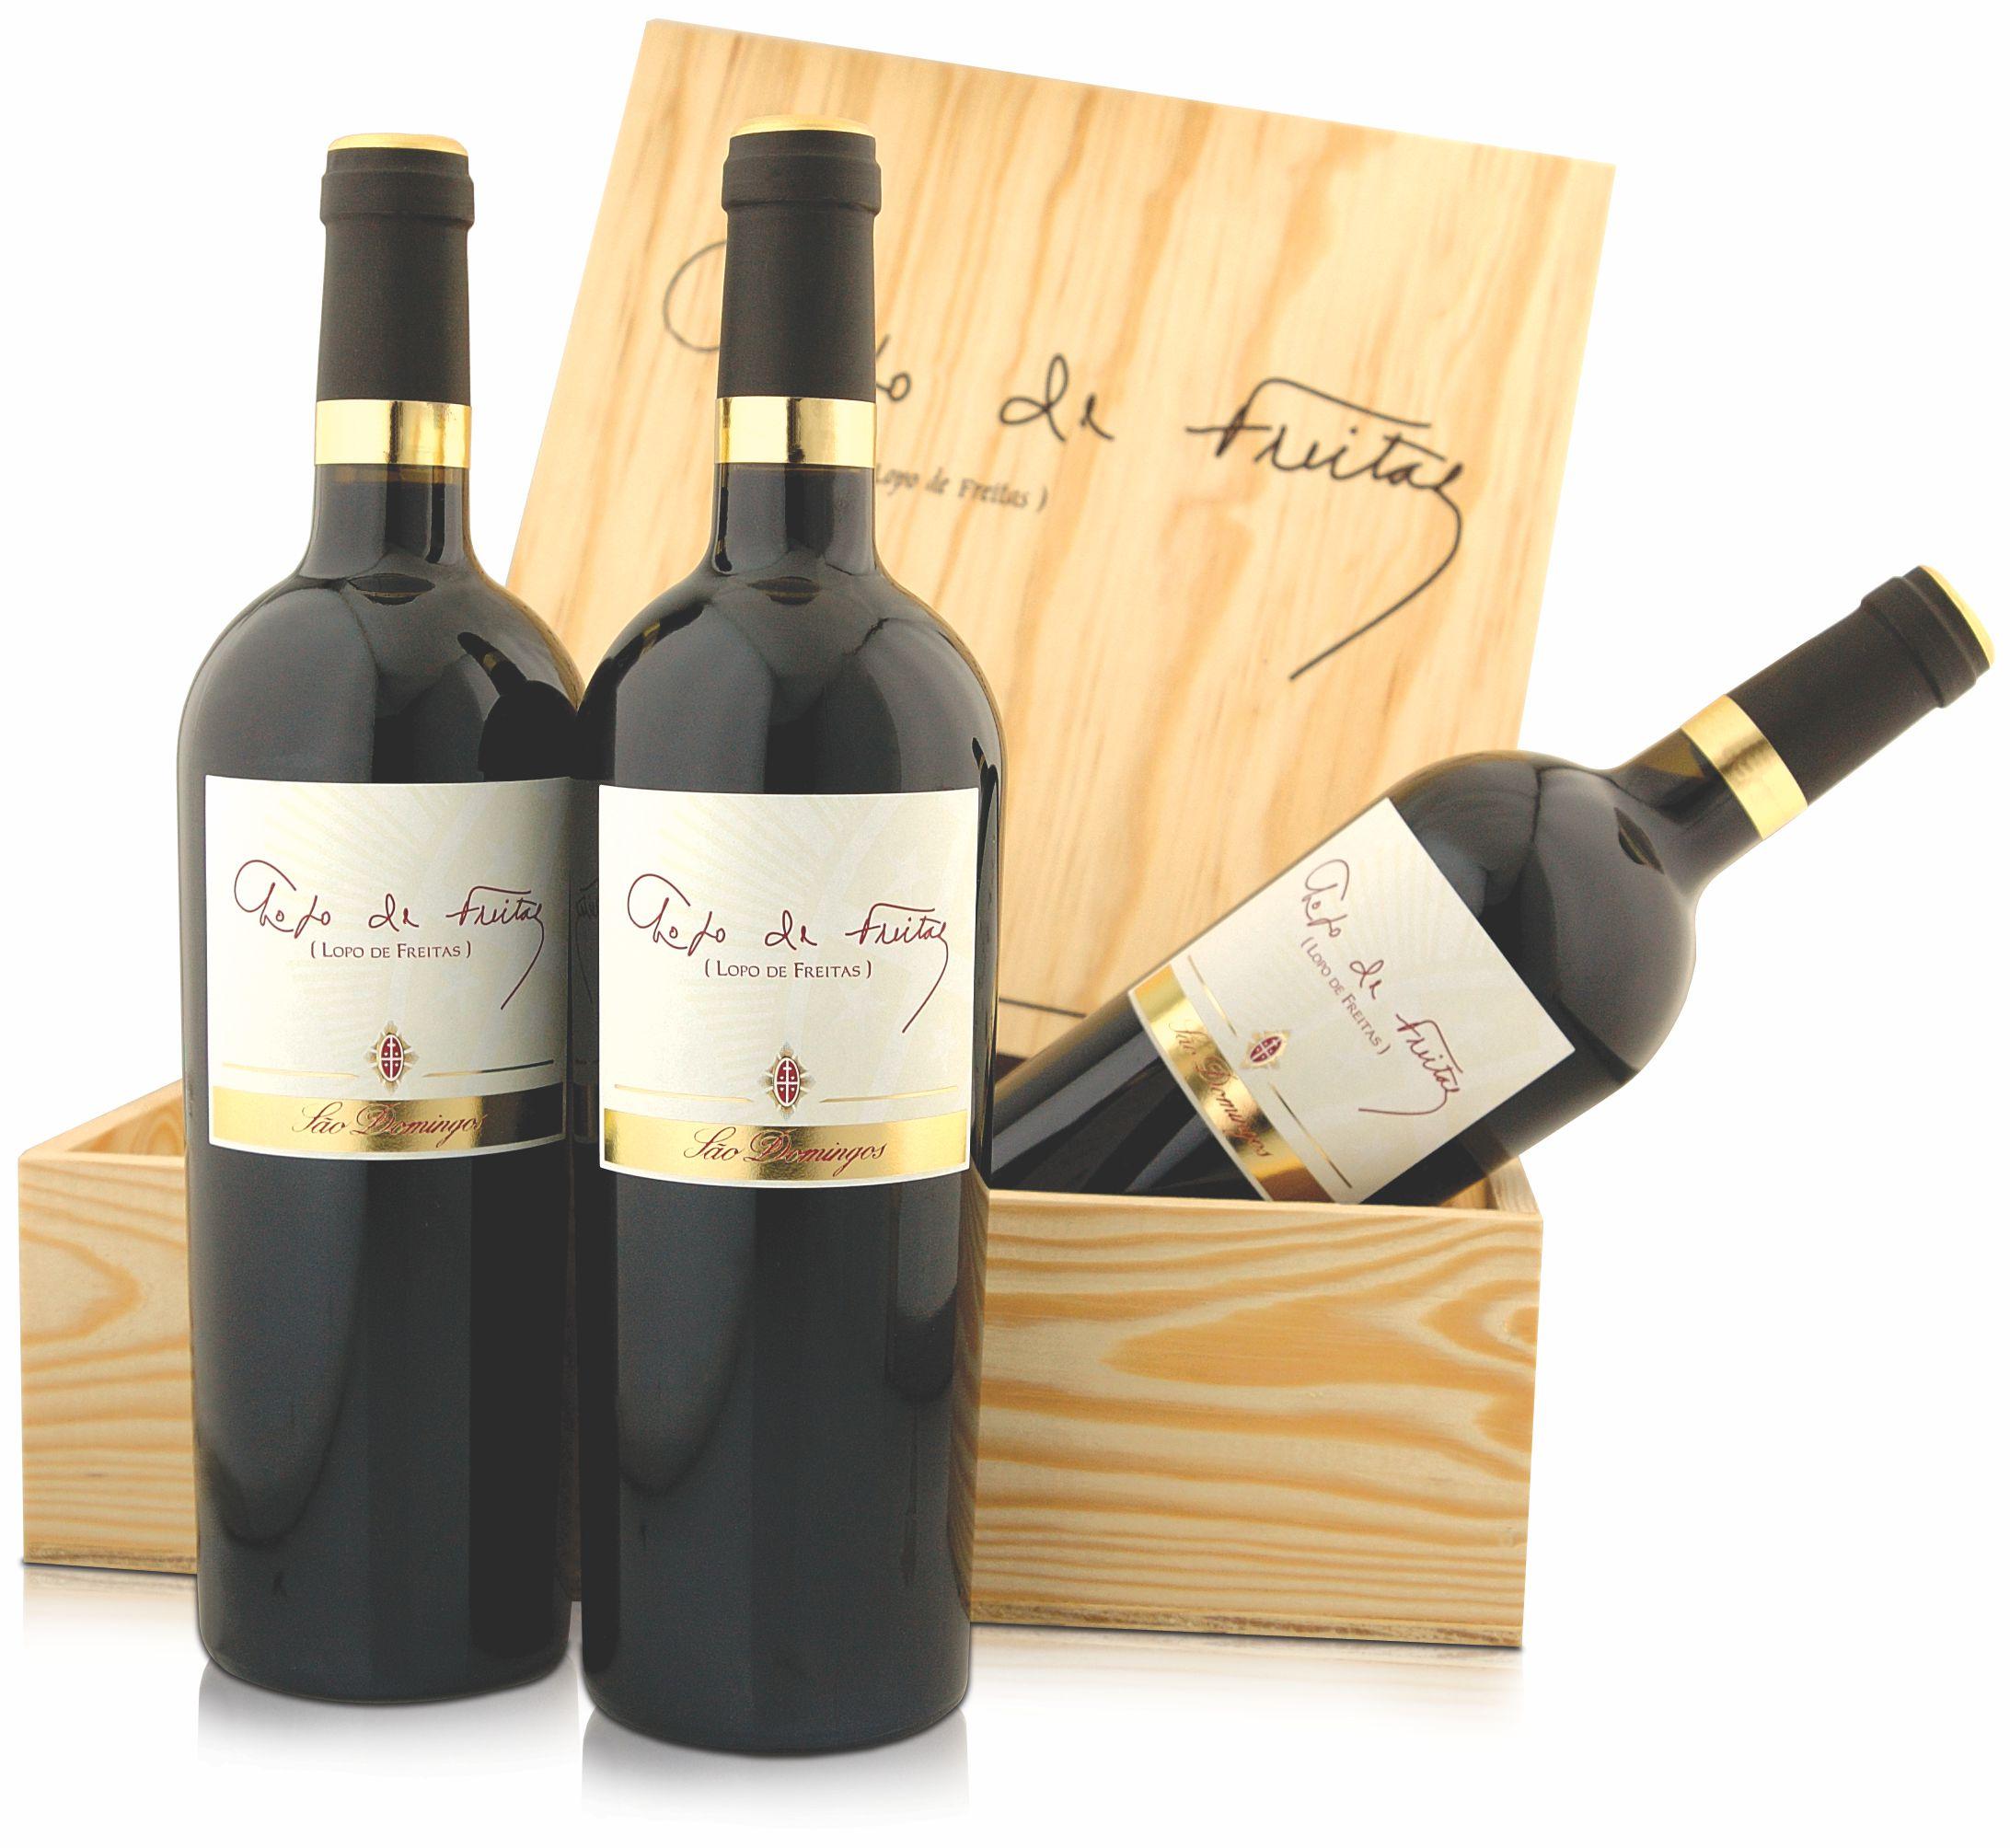 Lopo de Freitas red wine